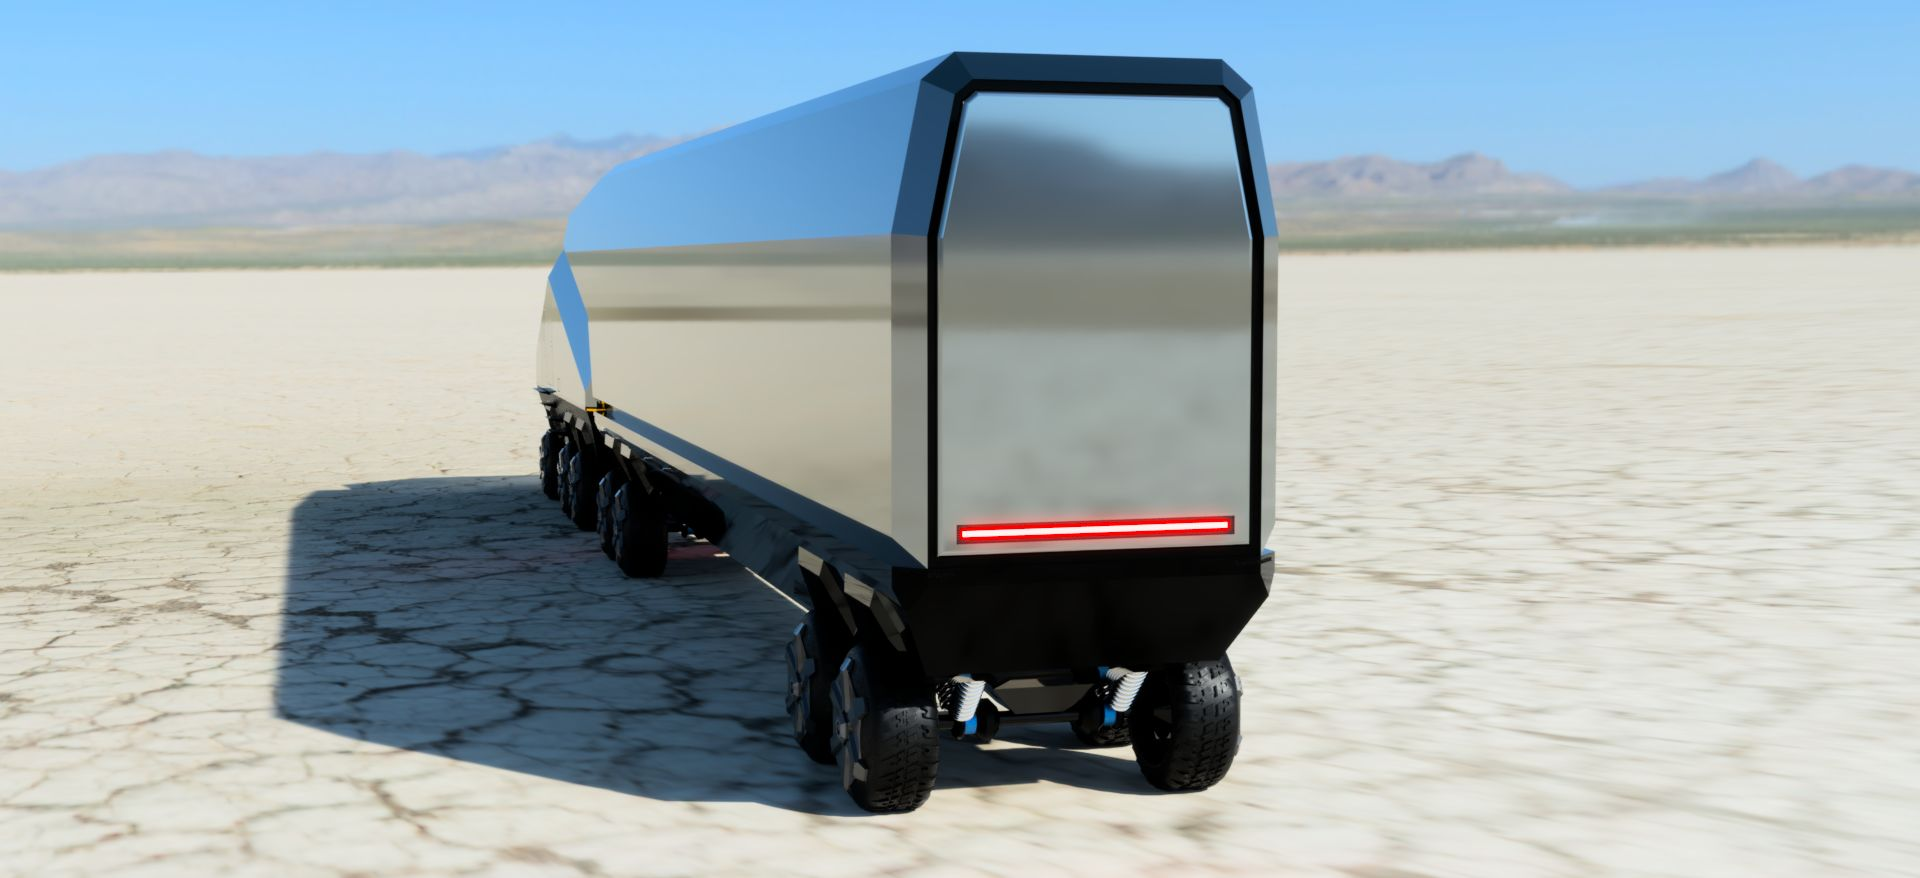 Tesla-cybervan-2020-apr-14-09-49-00am-000-customizedview16934796820-png-3500-3500